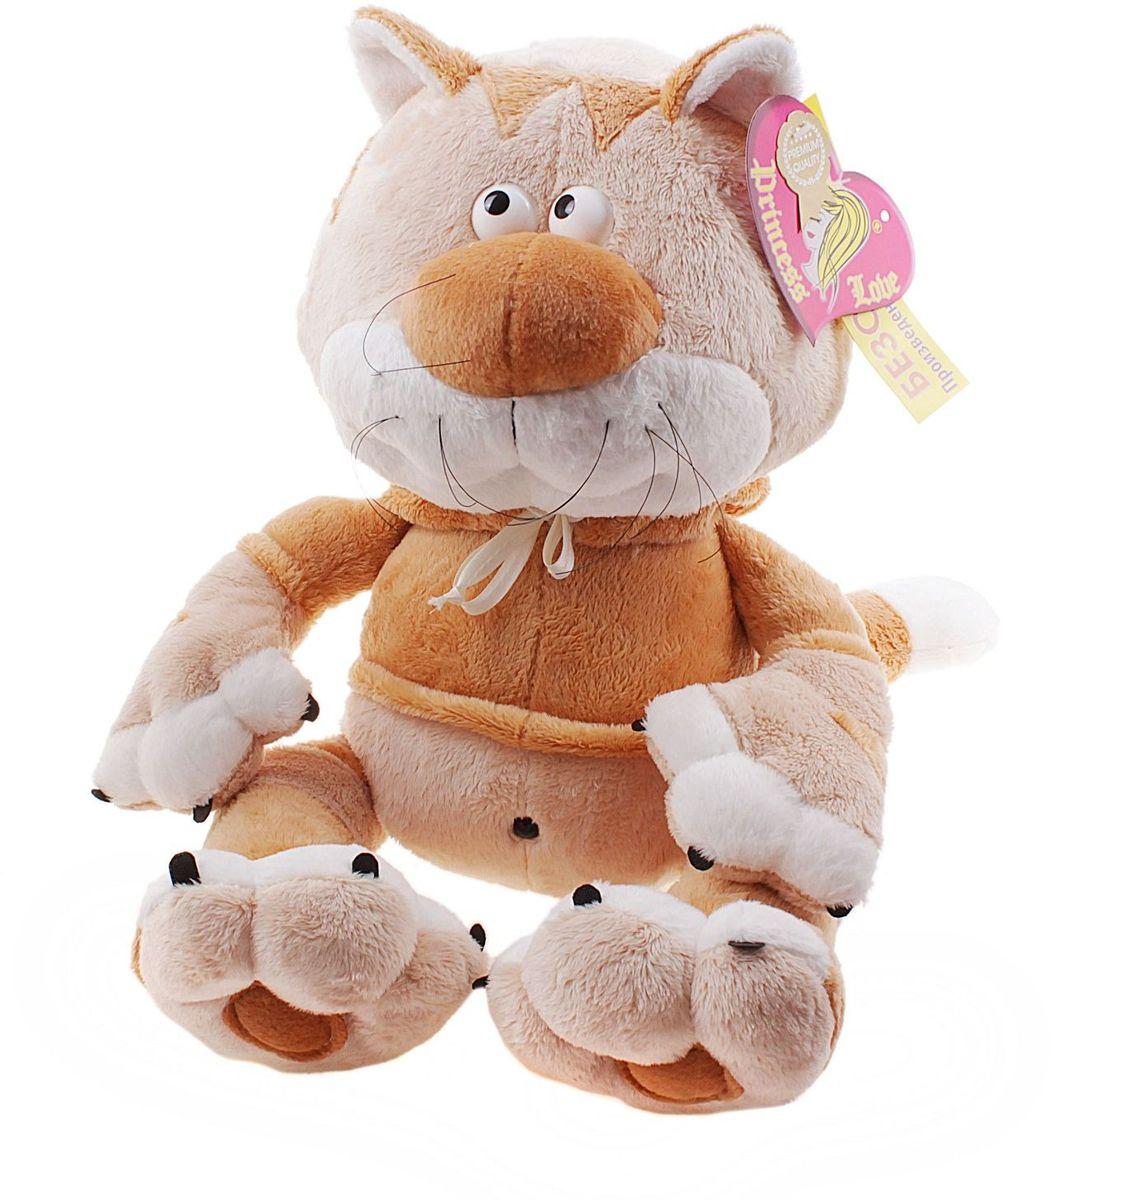 Princess Love Мягкая игрушка Кот Мурзик 50 см 689512 princess princess 142650 тостер